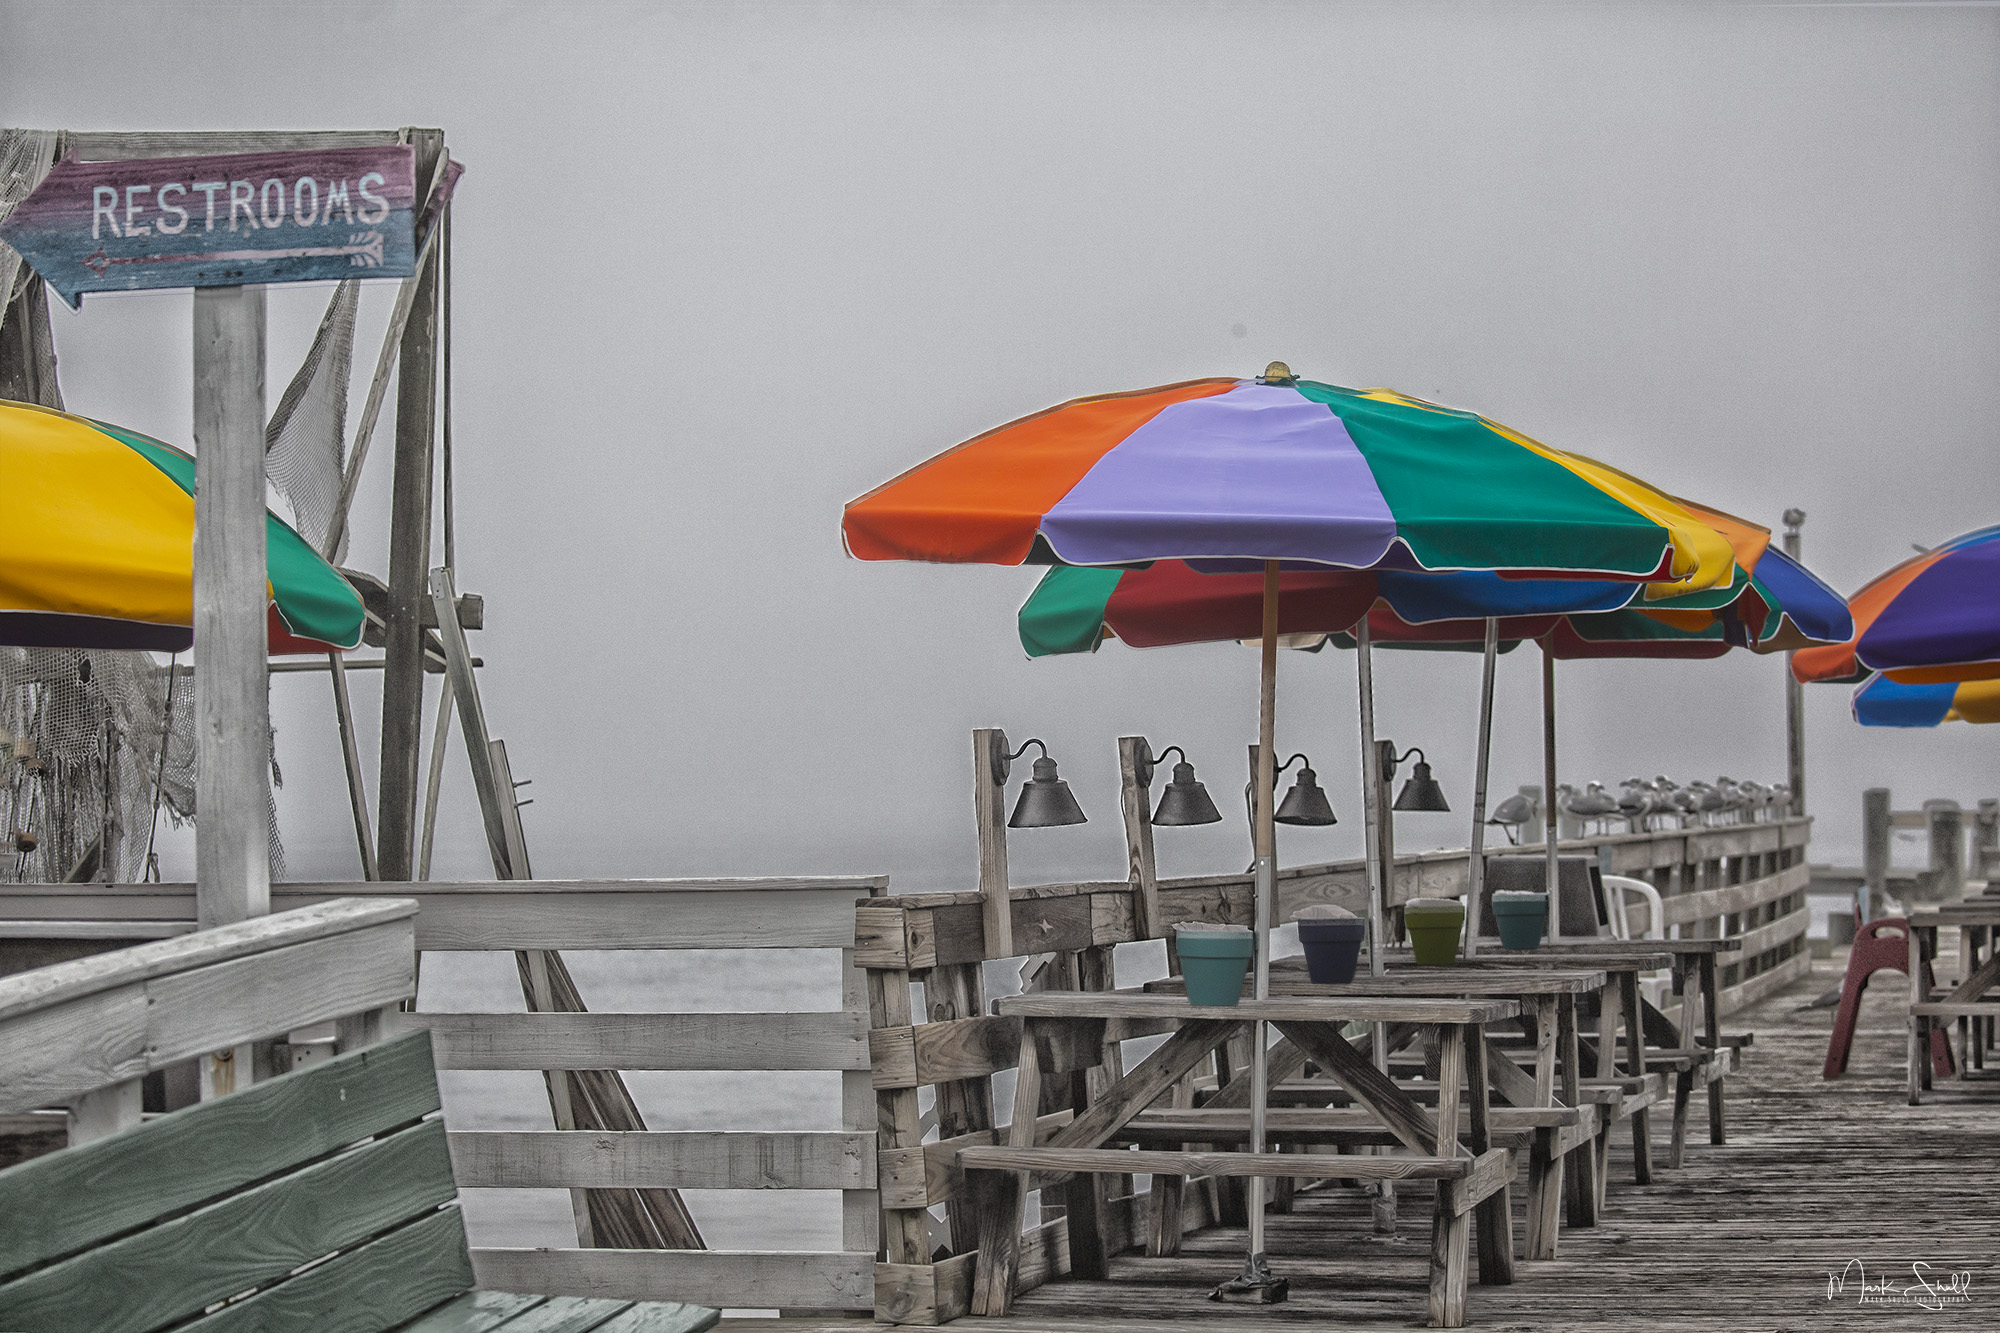 Dewey Destin's Seafood dock